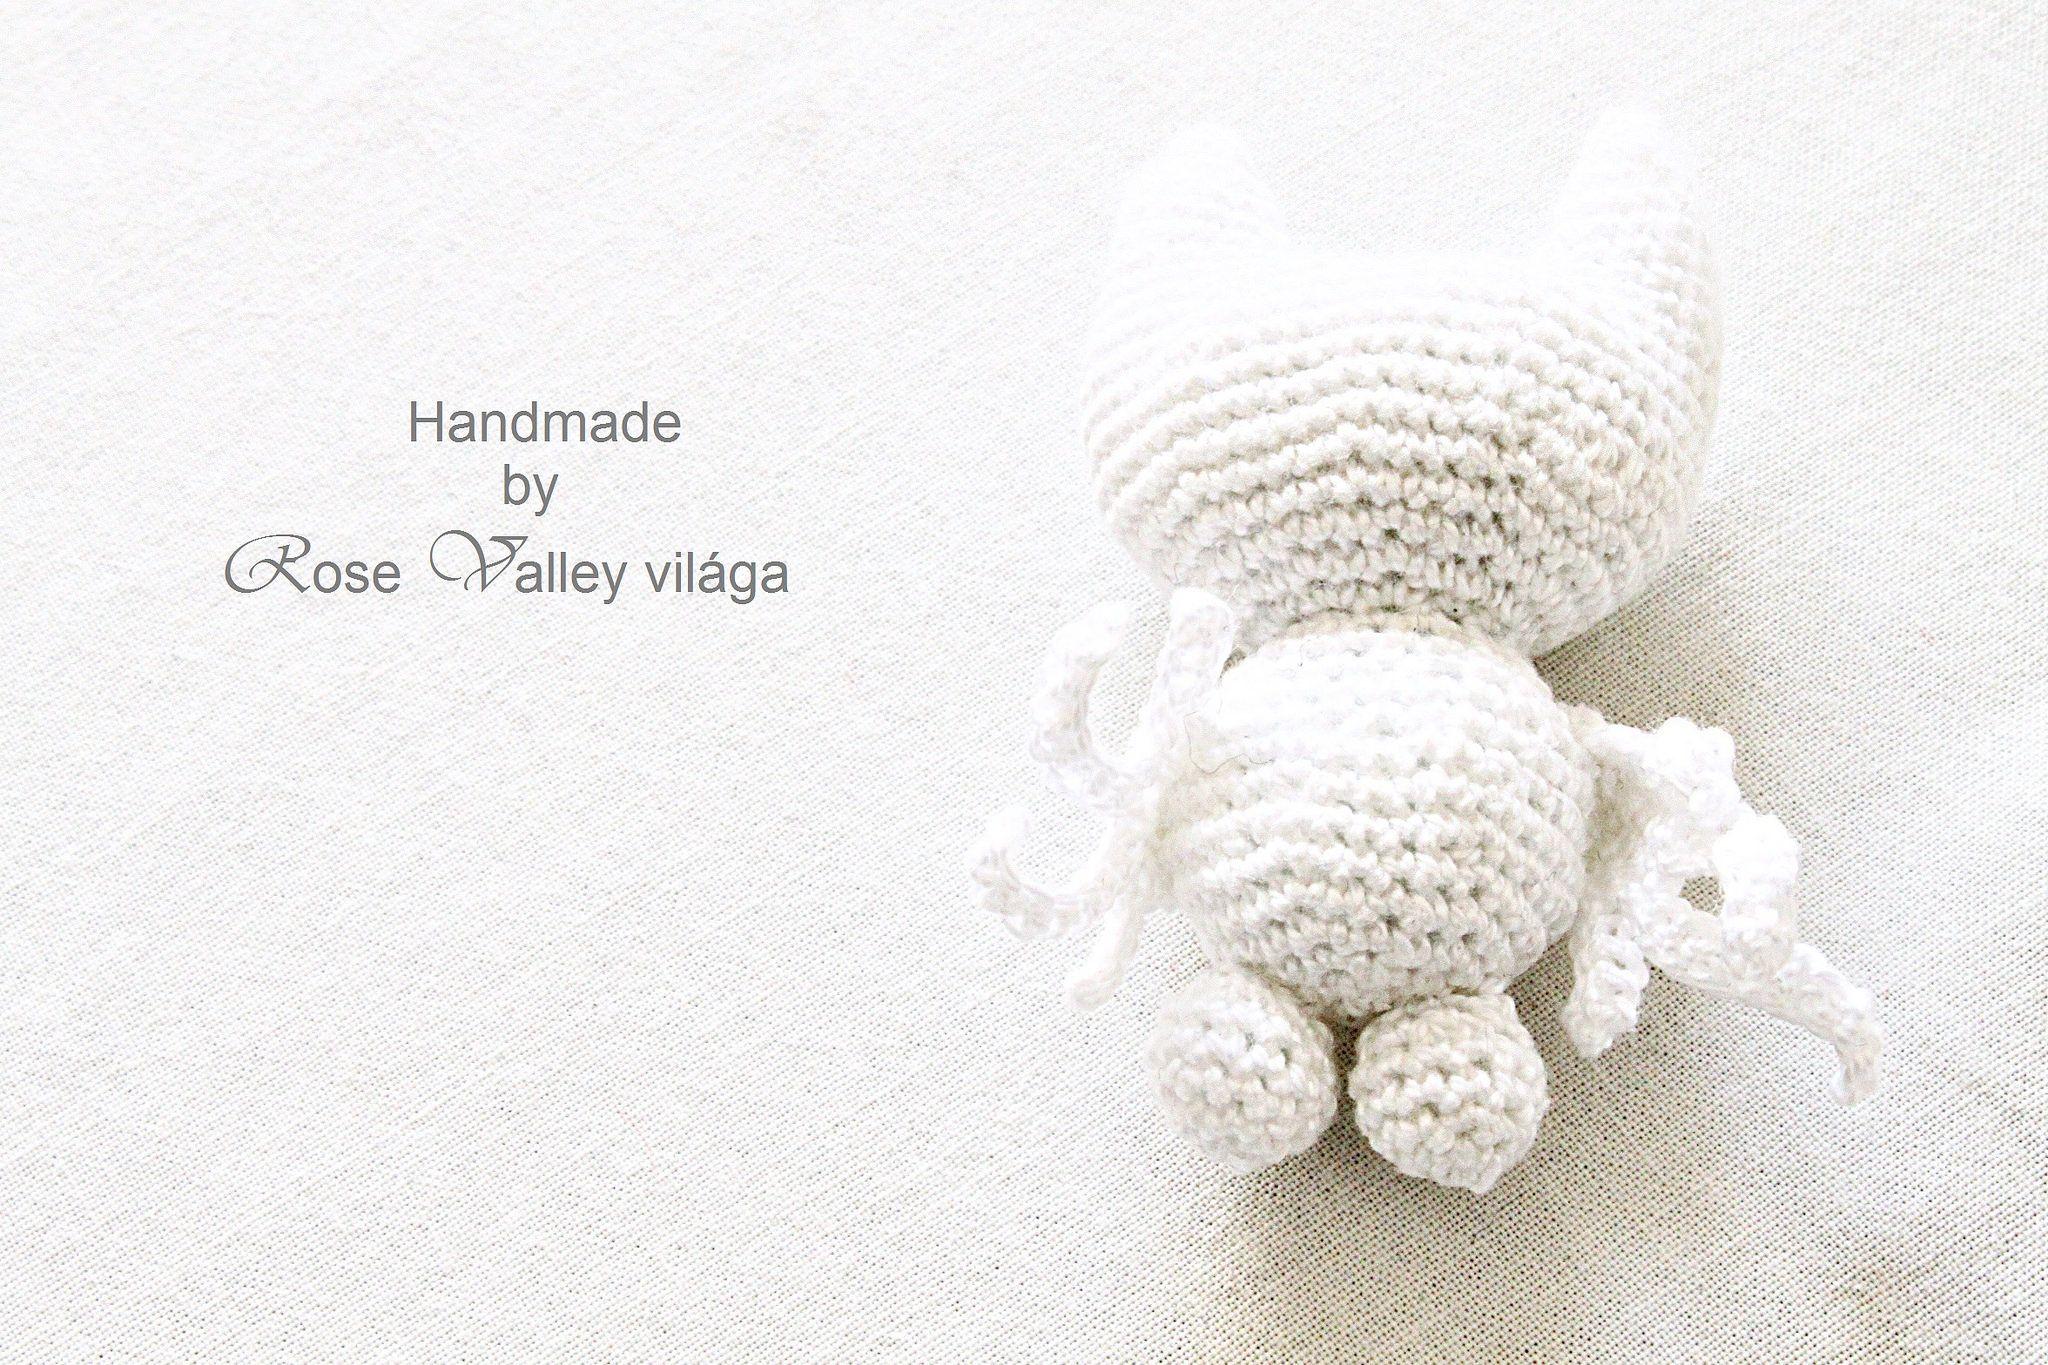 crochet semi-finished white owl body e851650ea1